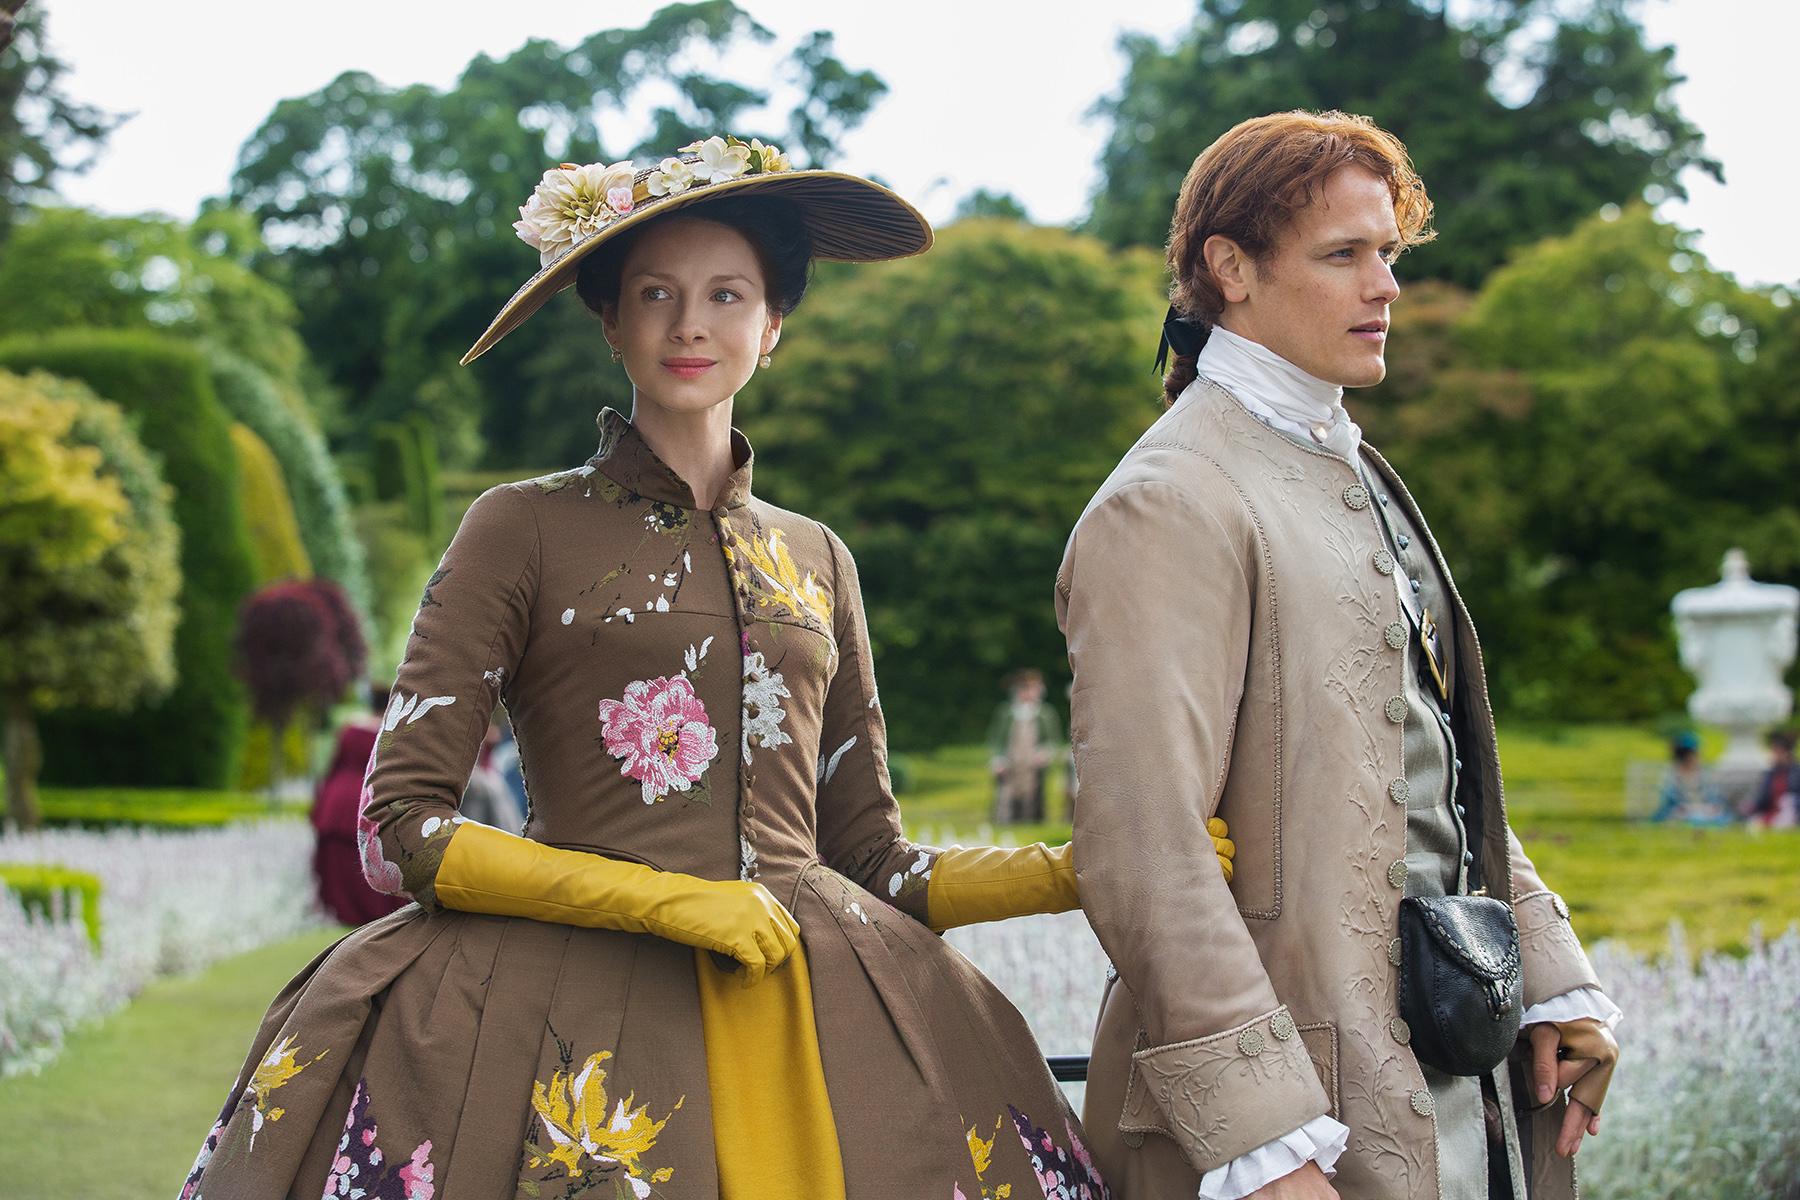 Caitriona-Balfe-as-Claire-Fraser-and-Sam-Heughan-as-Jamie-Fraser-in-Outlander-Season-2-Episode-5-Untimely-Resurrection